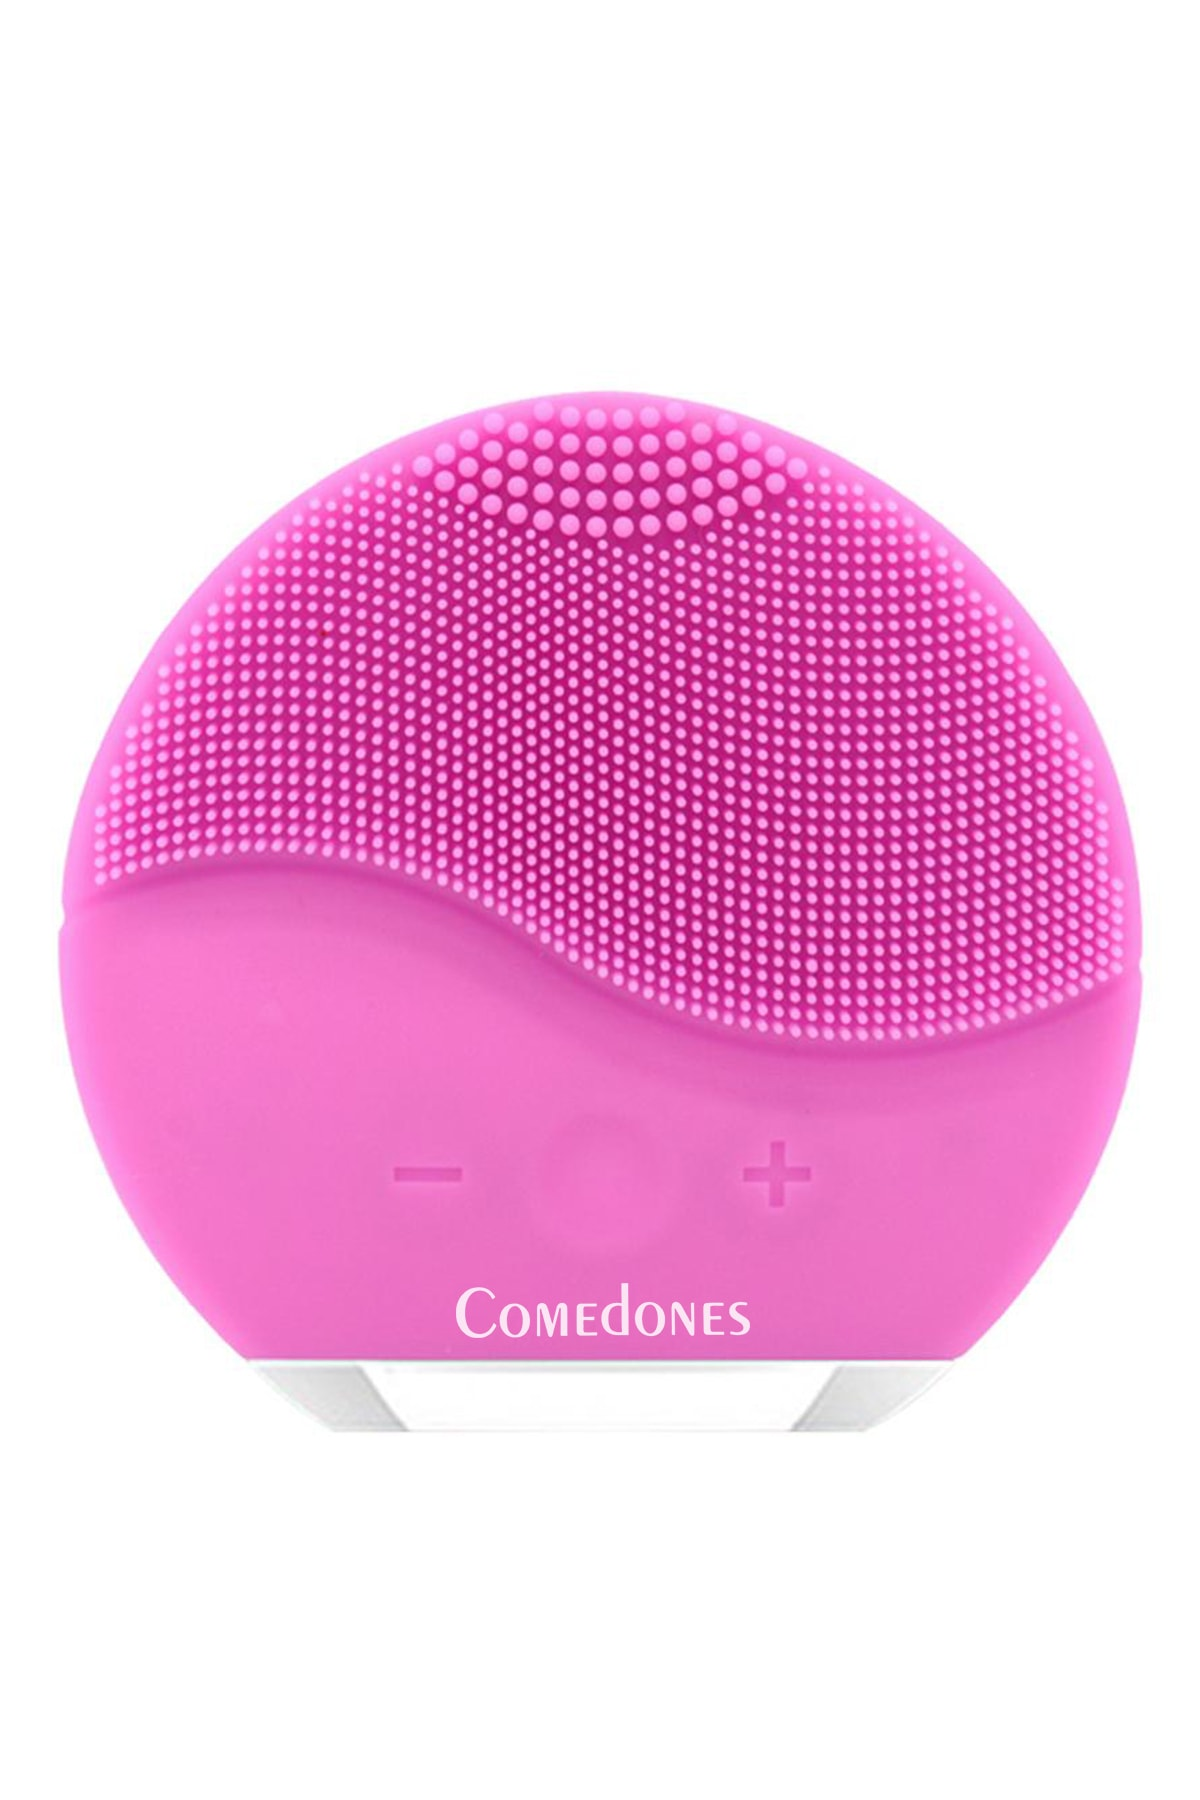 comedones Pure Sonic Yüz Temizleme Cihazı 8680738477842 1